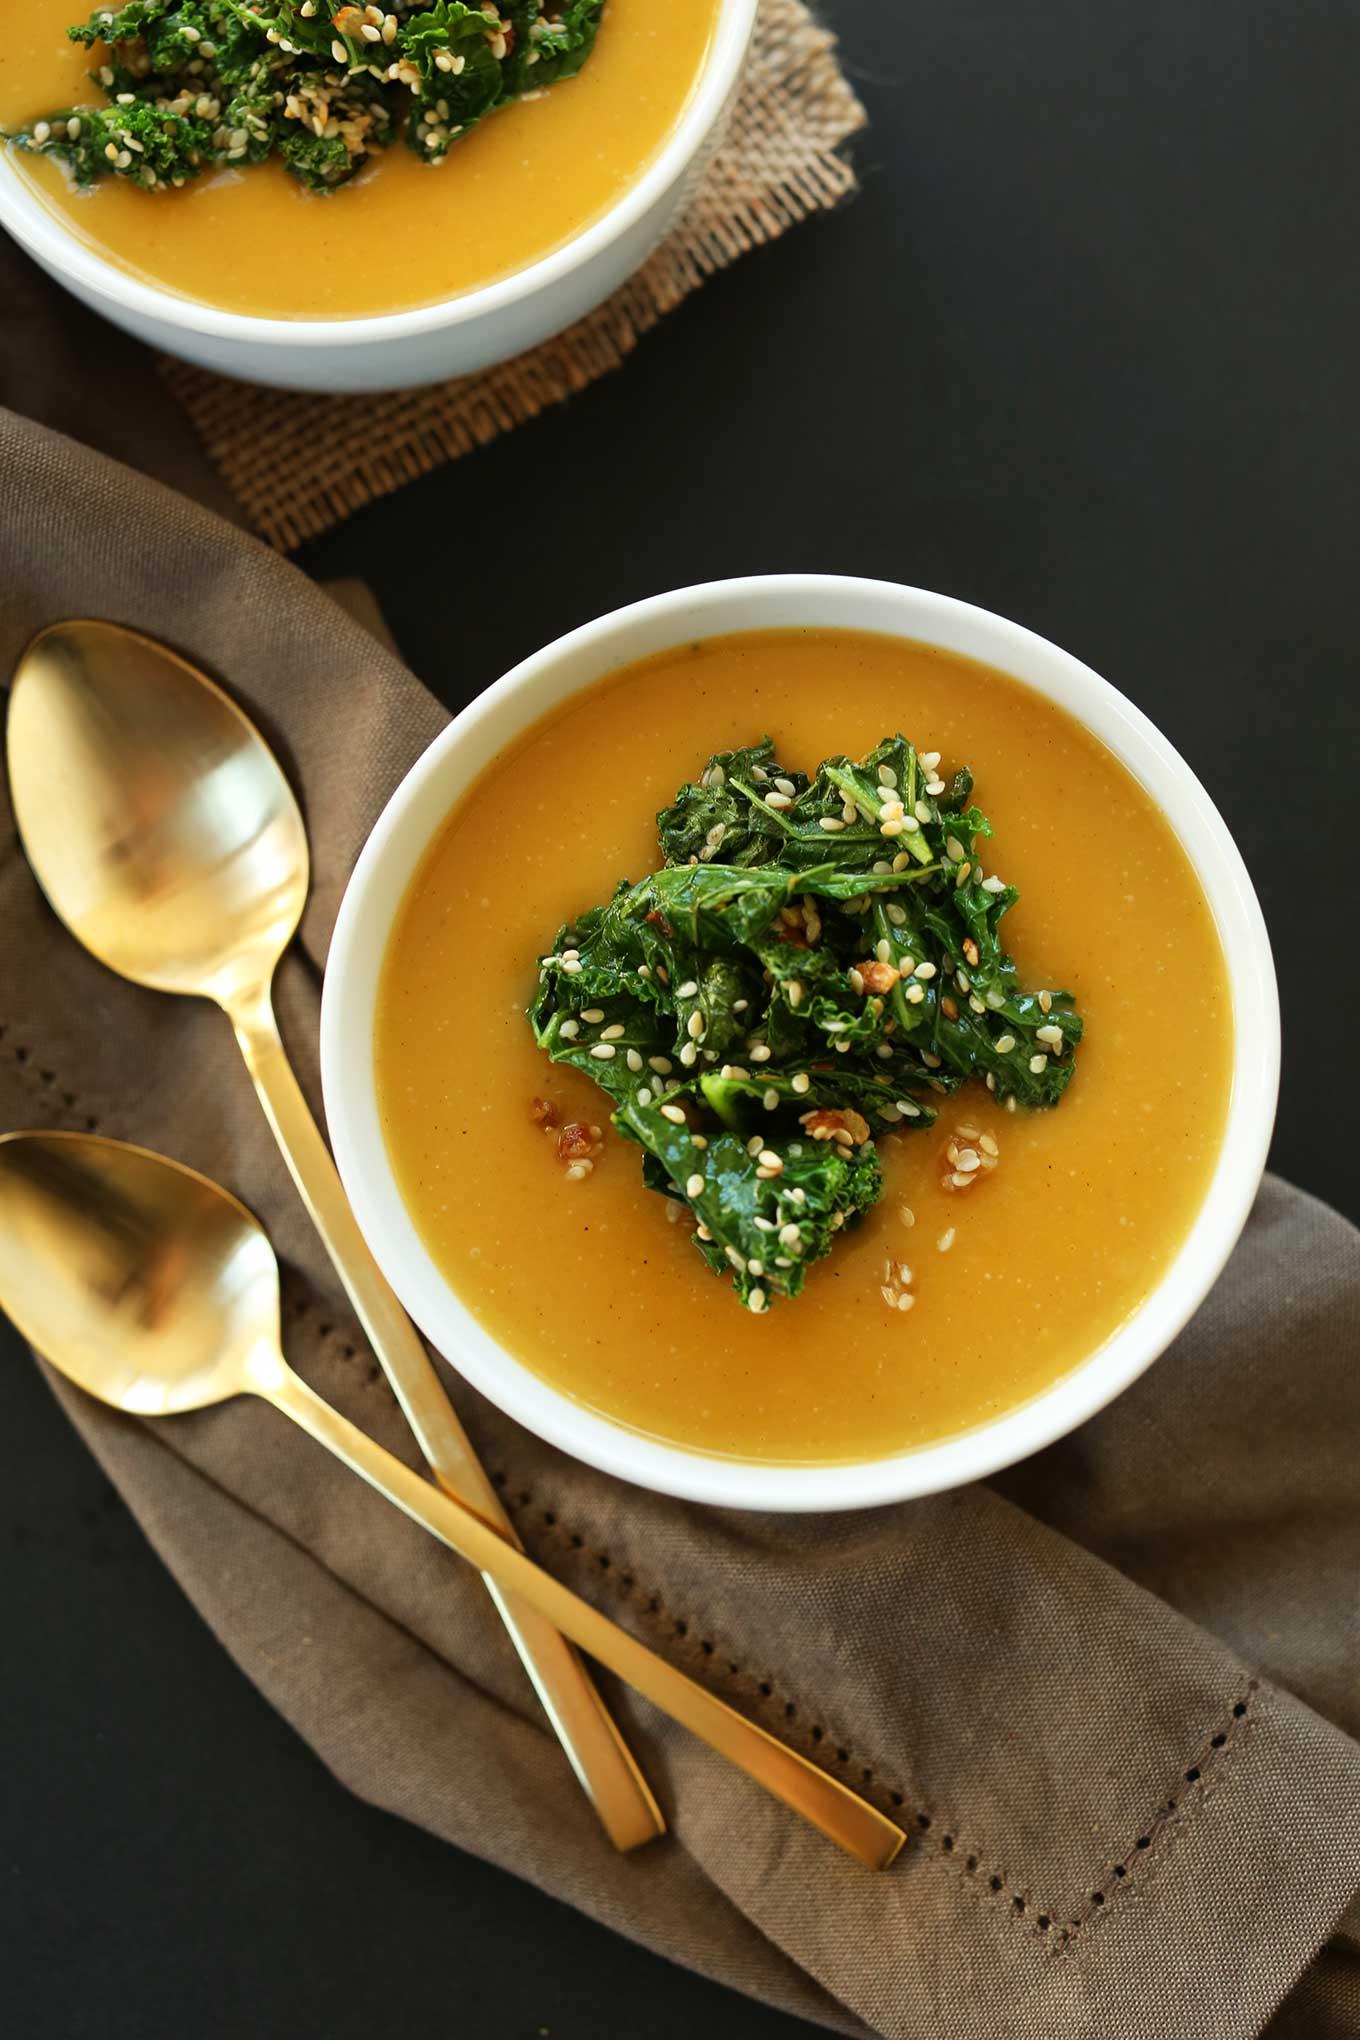 Overhead shot of bowls of gluten-free vegan pumpkin soup with sesame kale topping